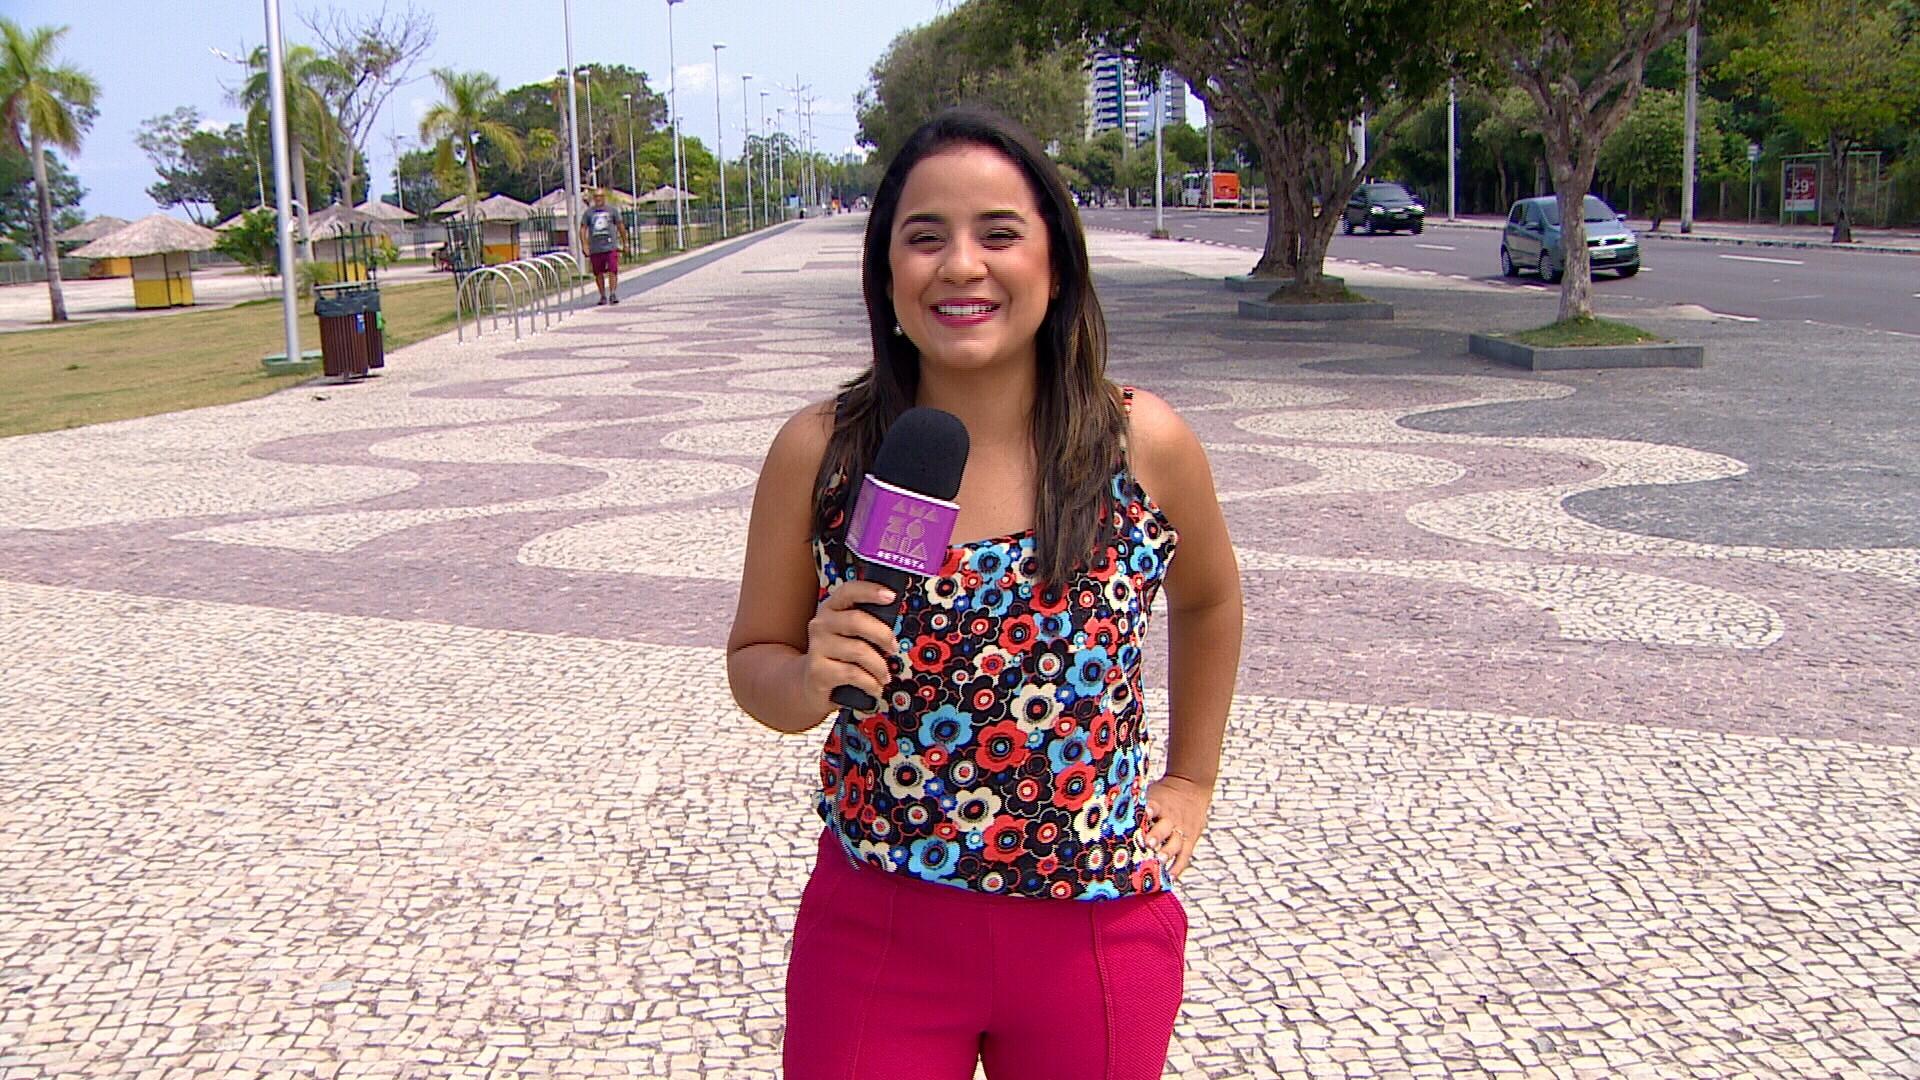 Ruthiene Bindá grava programa na Ponta Negra, ponto turístico de Manaus (Foto: Amazônia Revista)